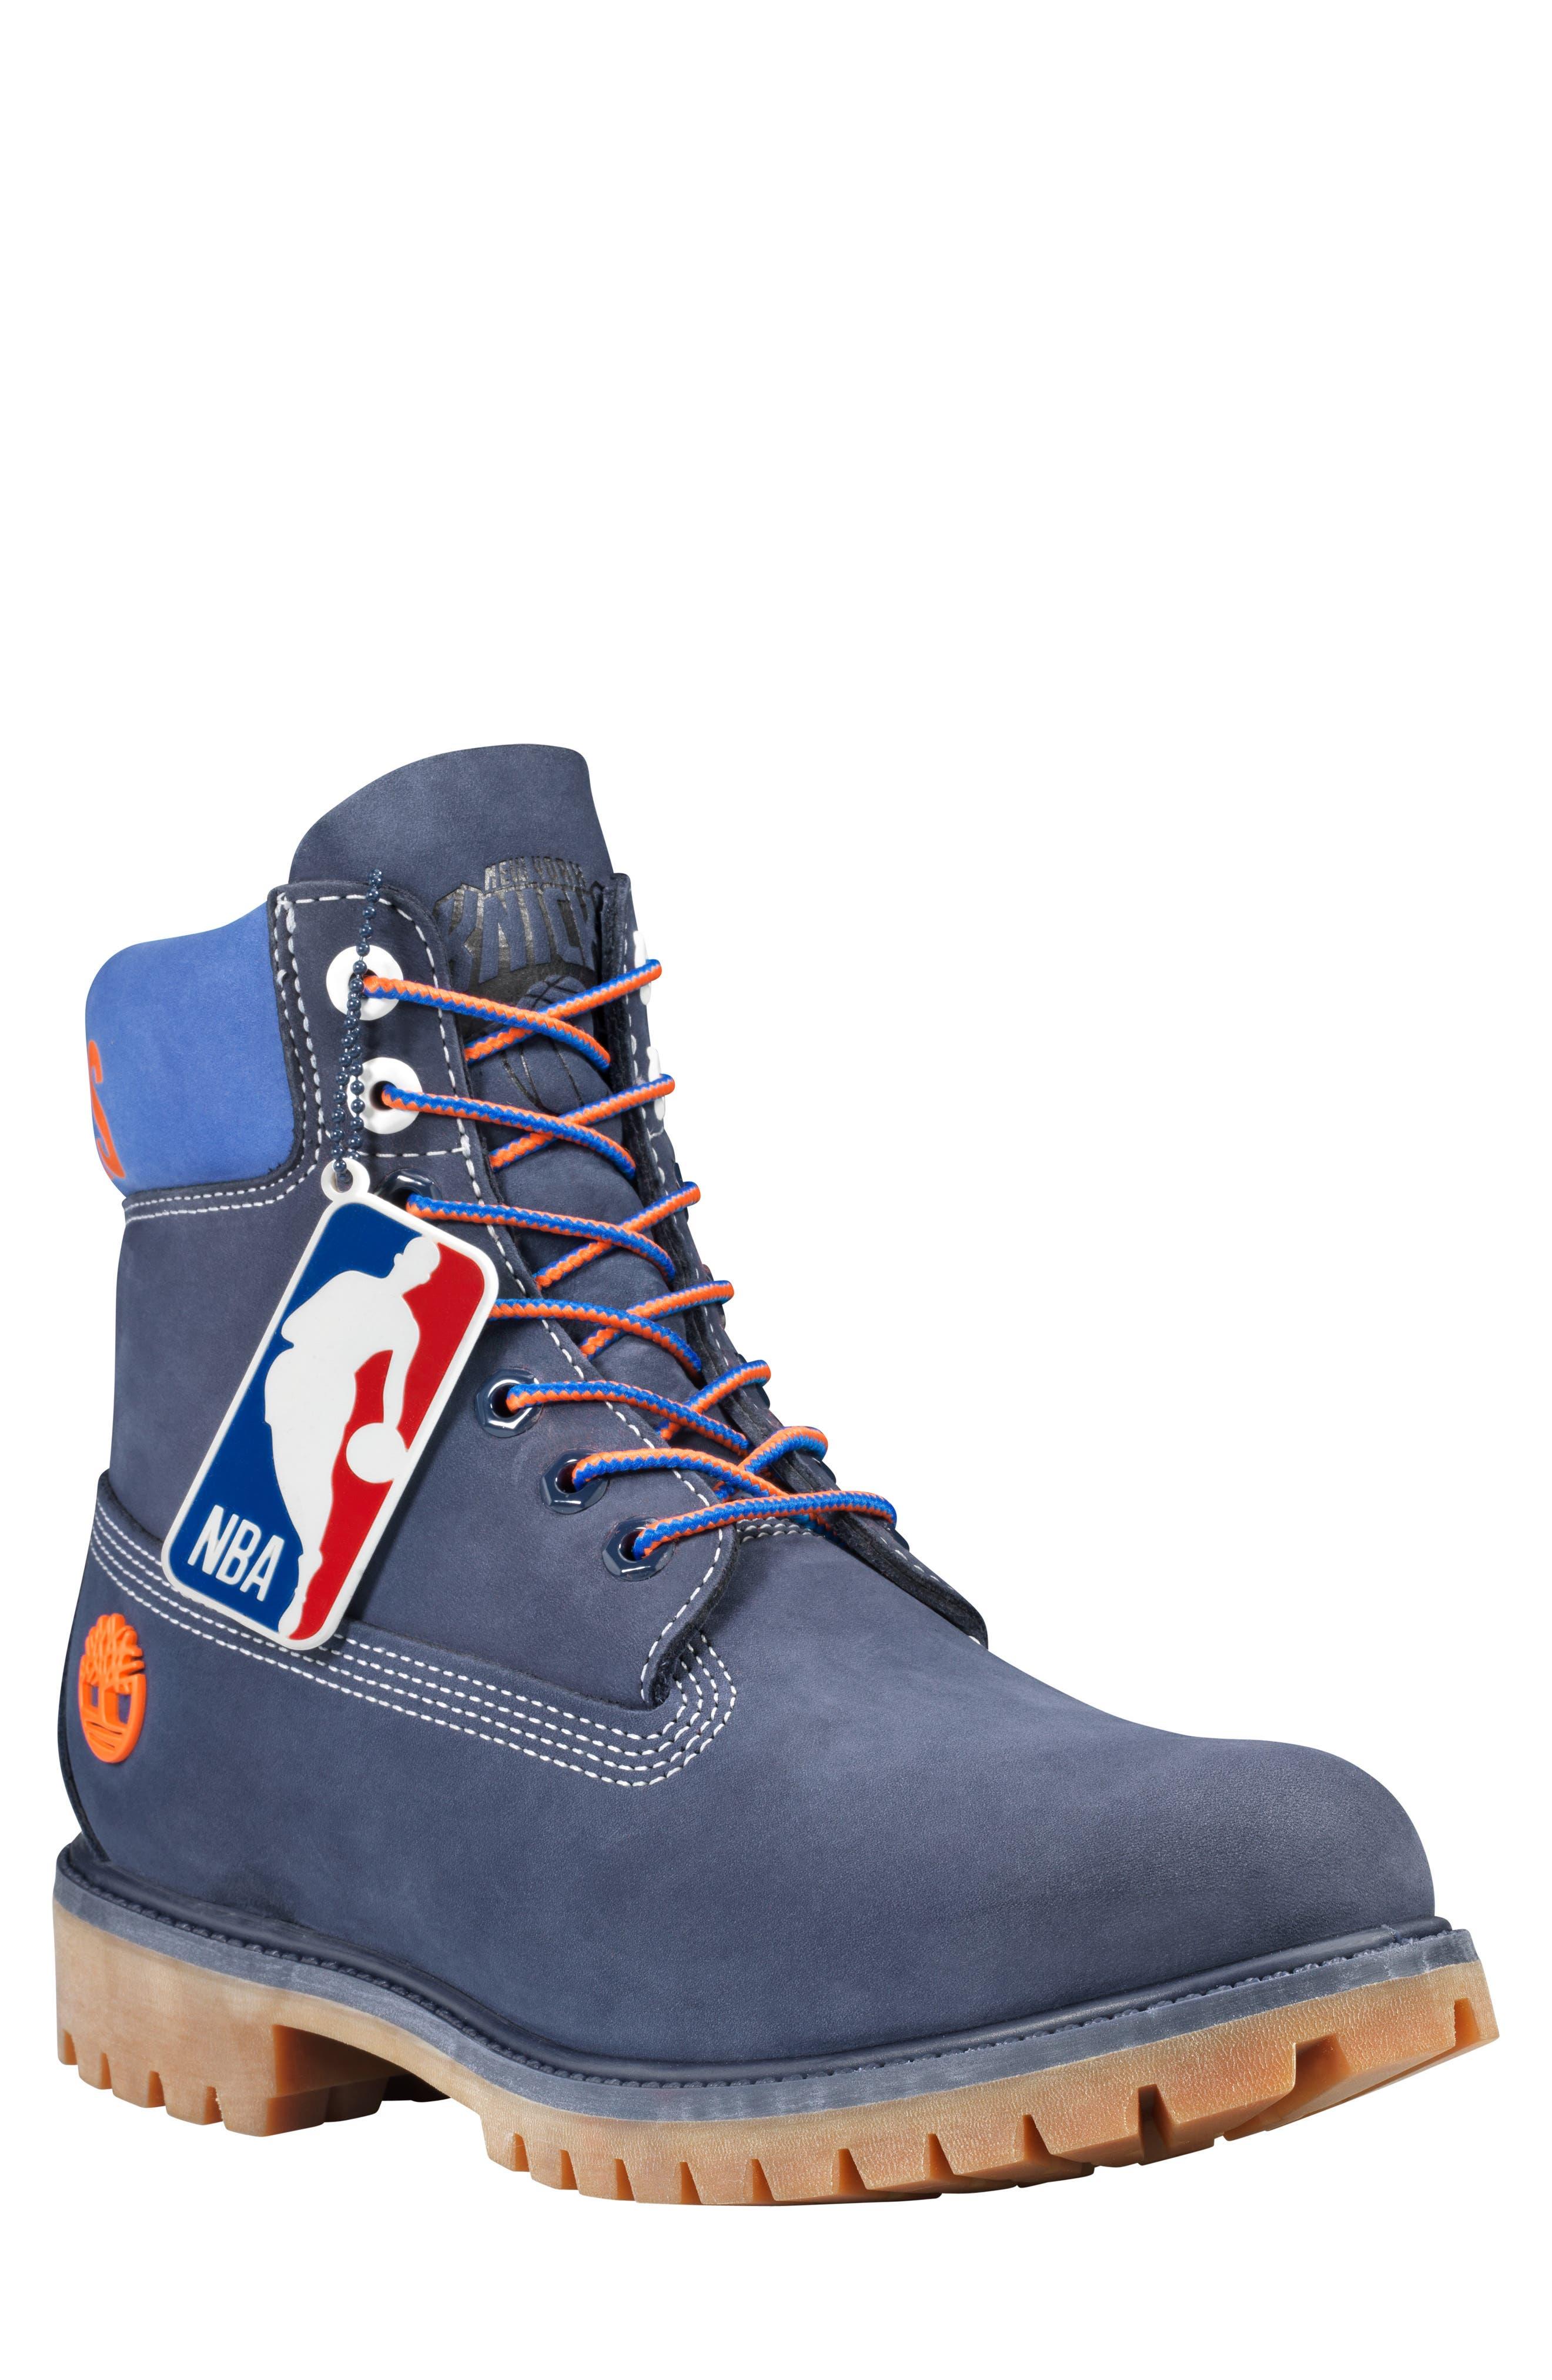 Timberland New York Knicks Plain Toe Boot, Blue